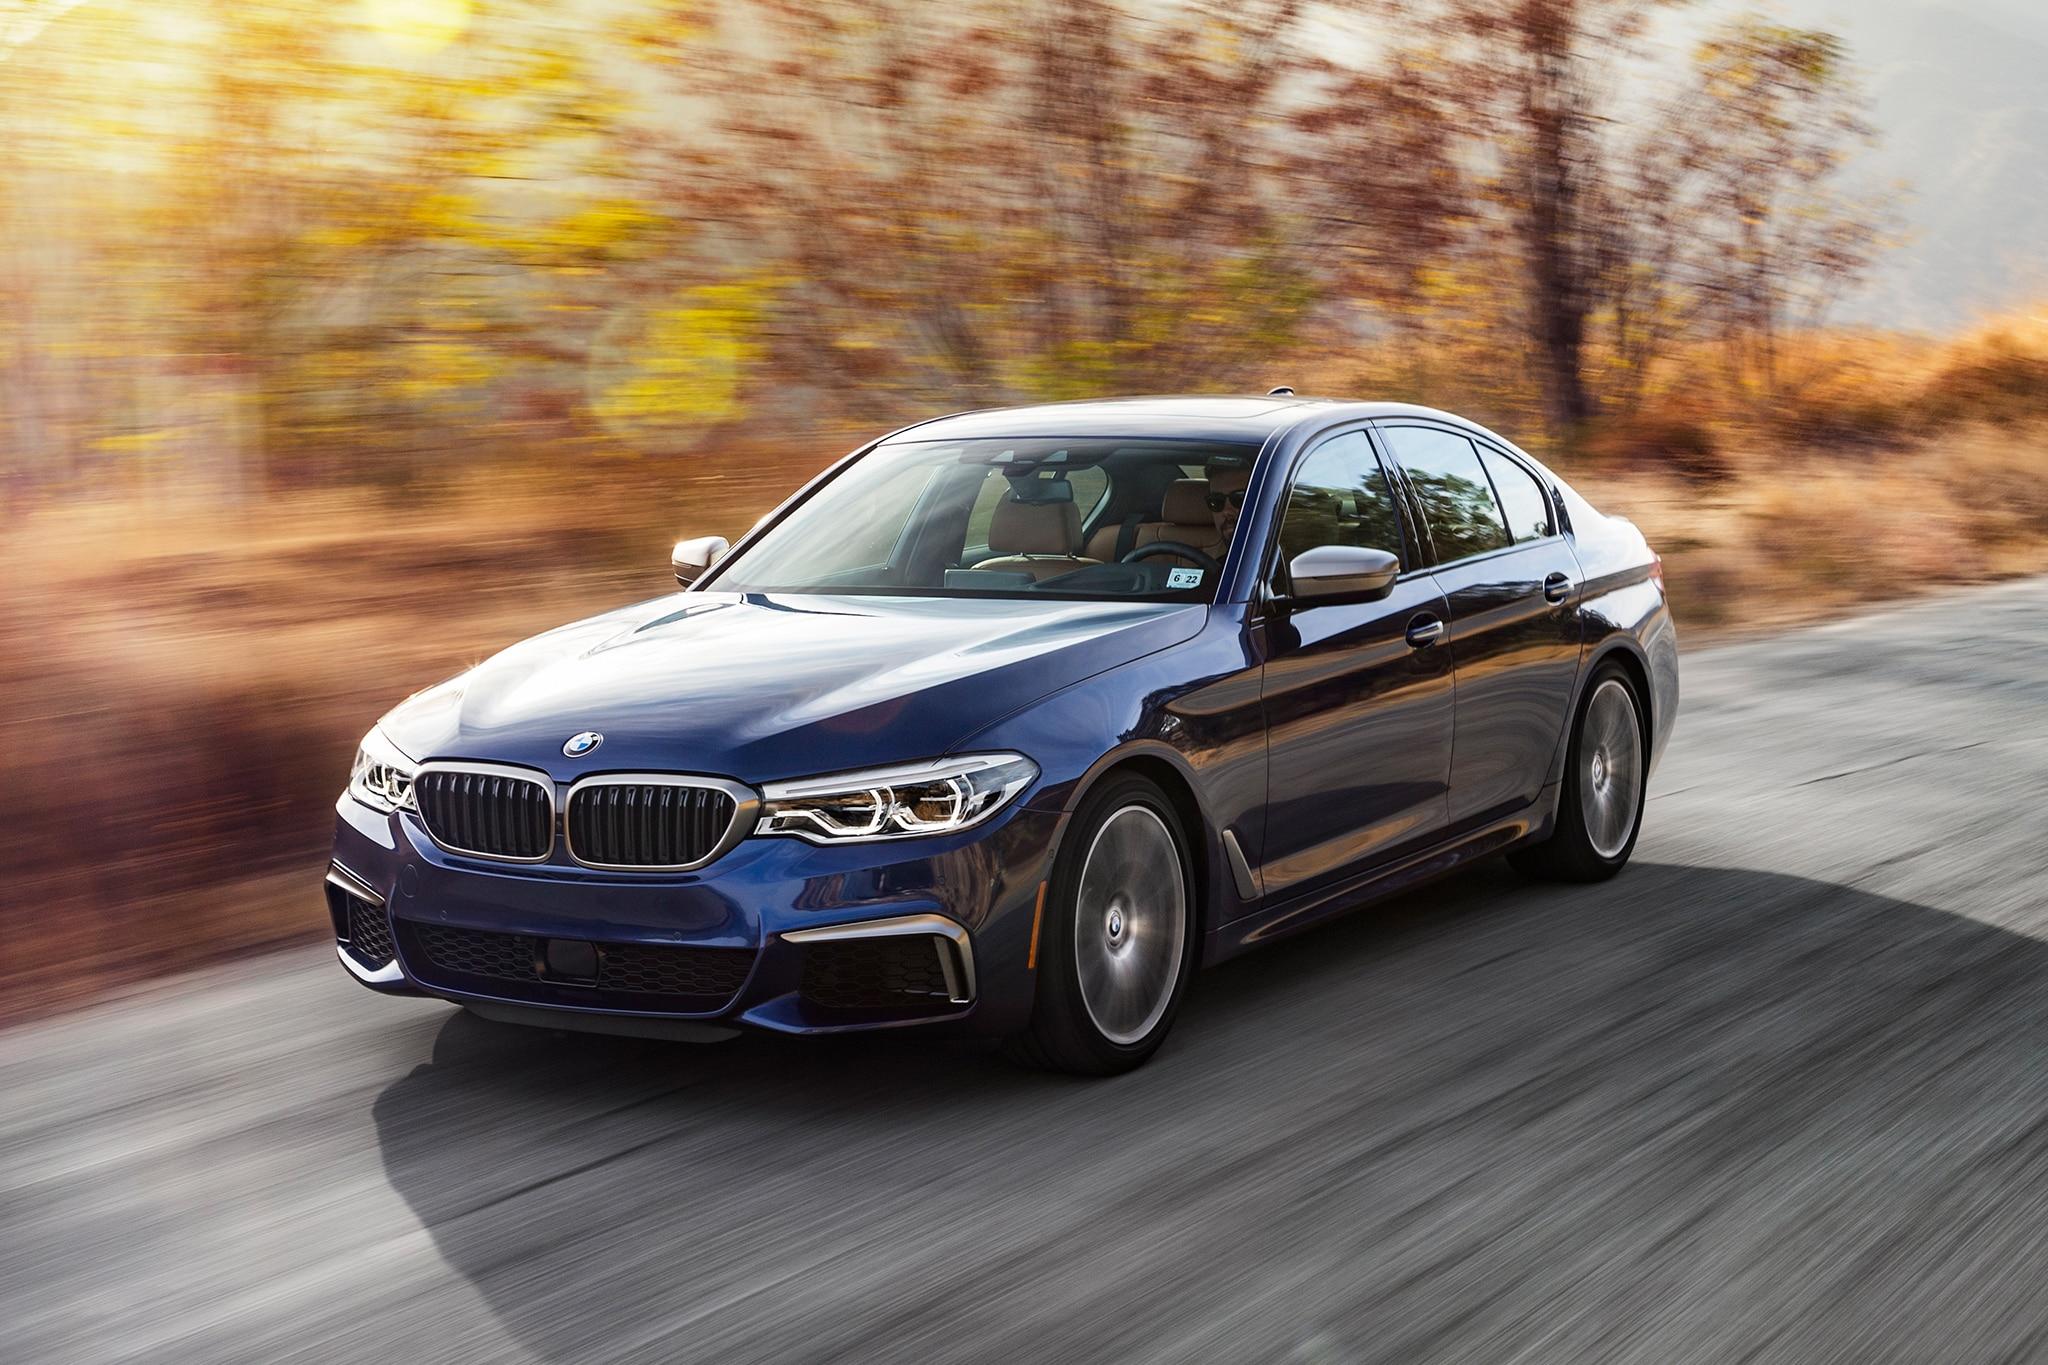 2018 BMW M550i Front Three Quarter In Motion 01